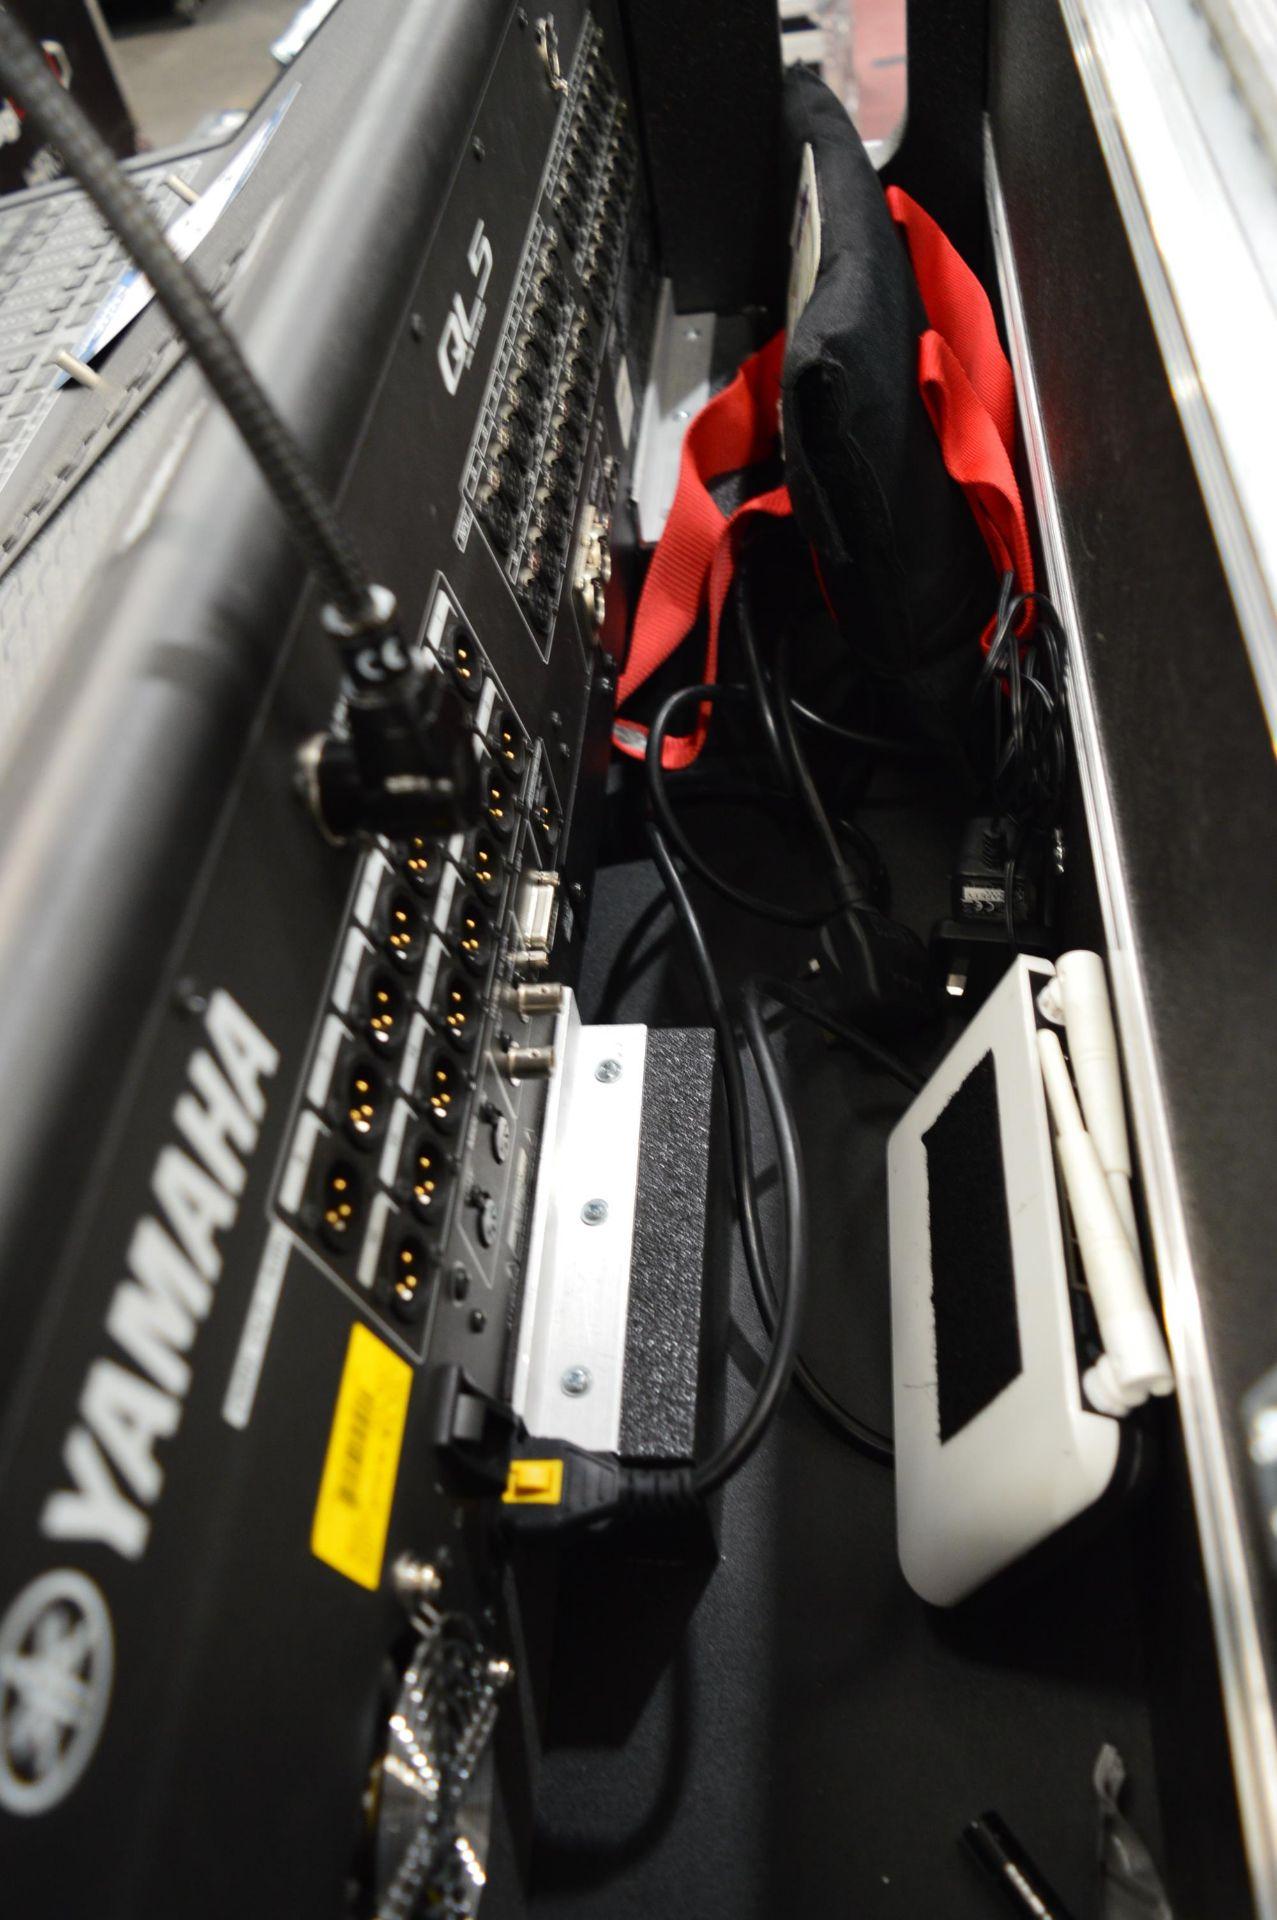 Lot 502 - Yamaha, QL5 digital mixing console, Serial No. BAV